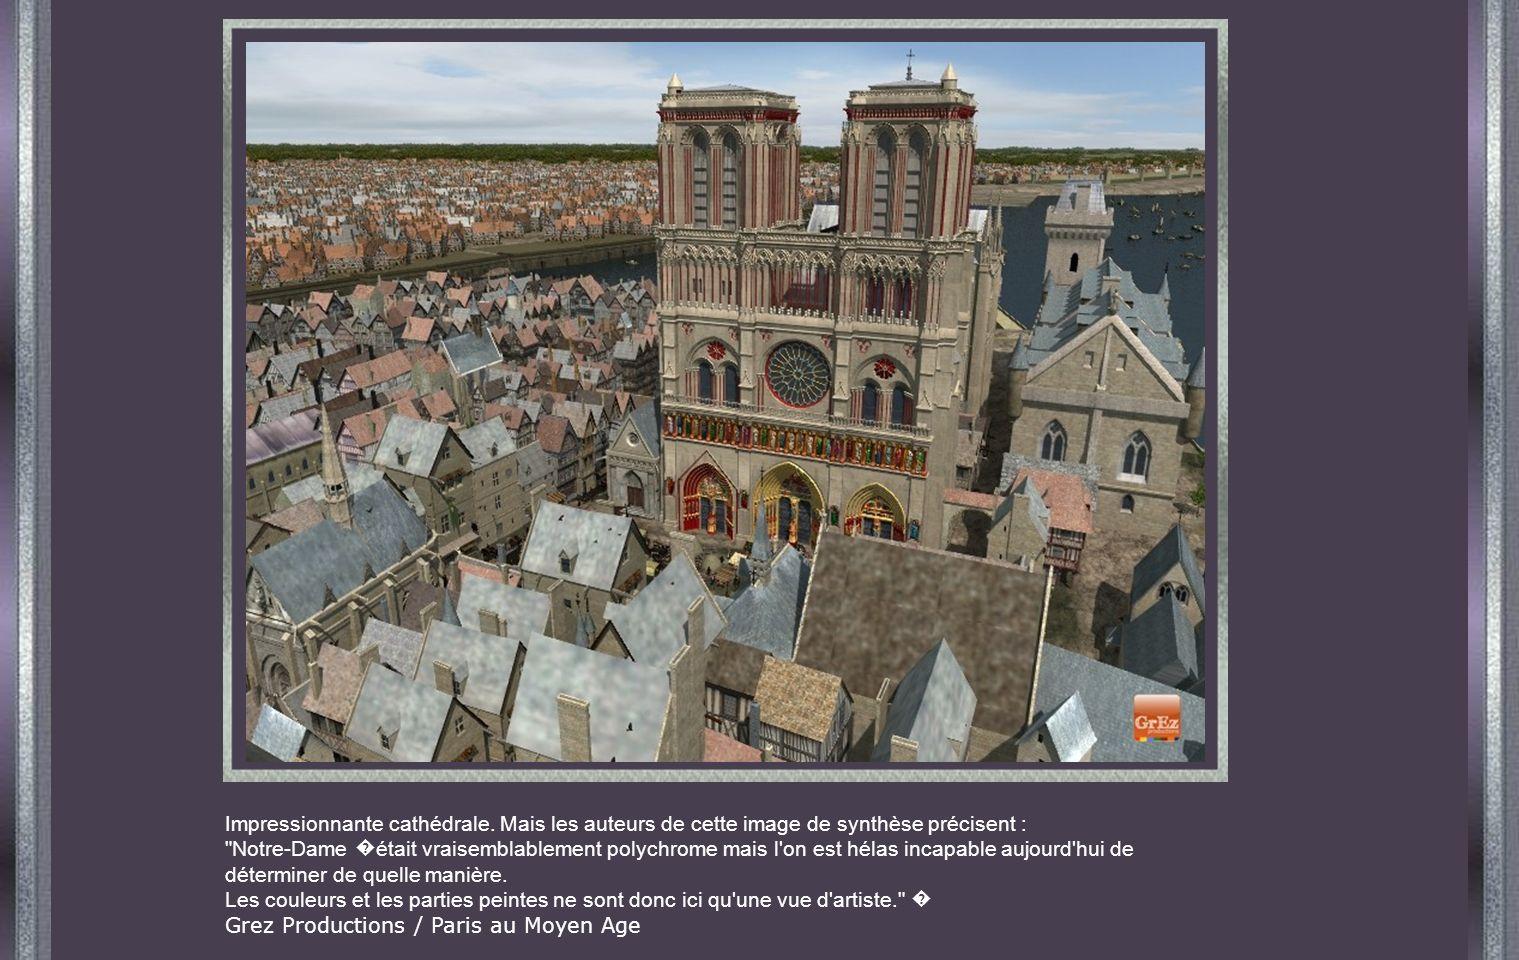 Impressionnante cathédrale.